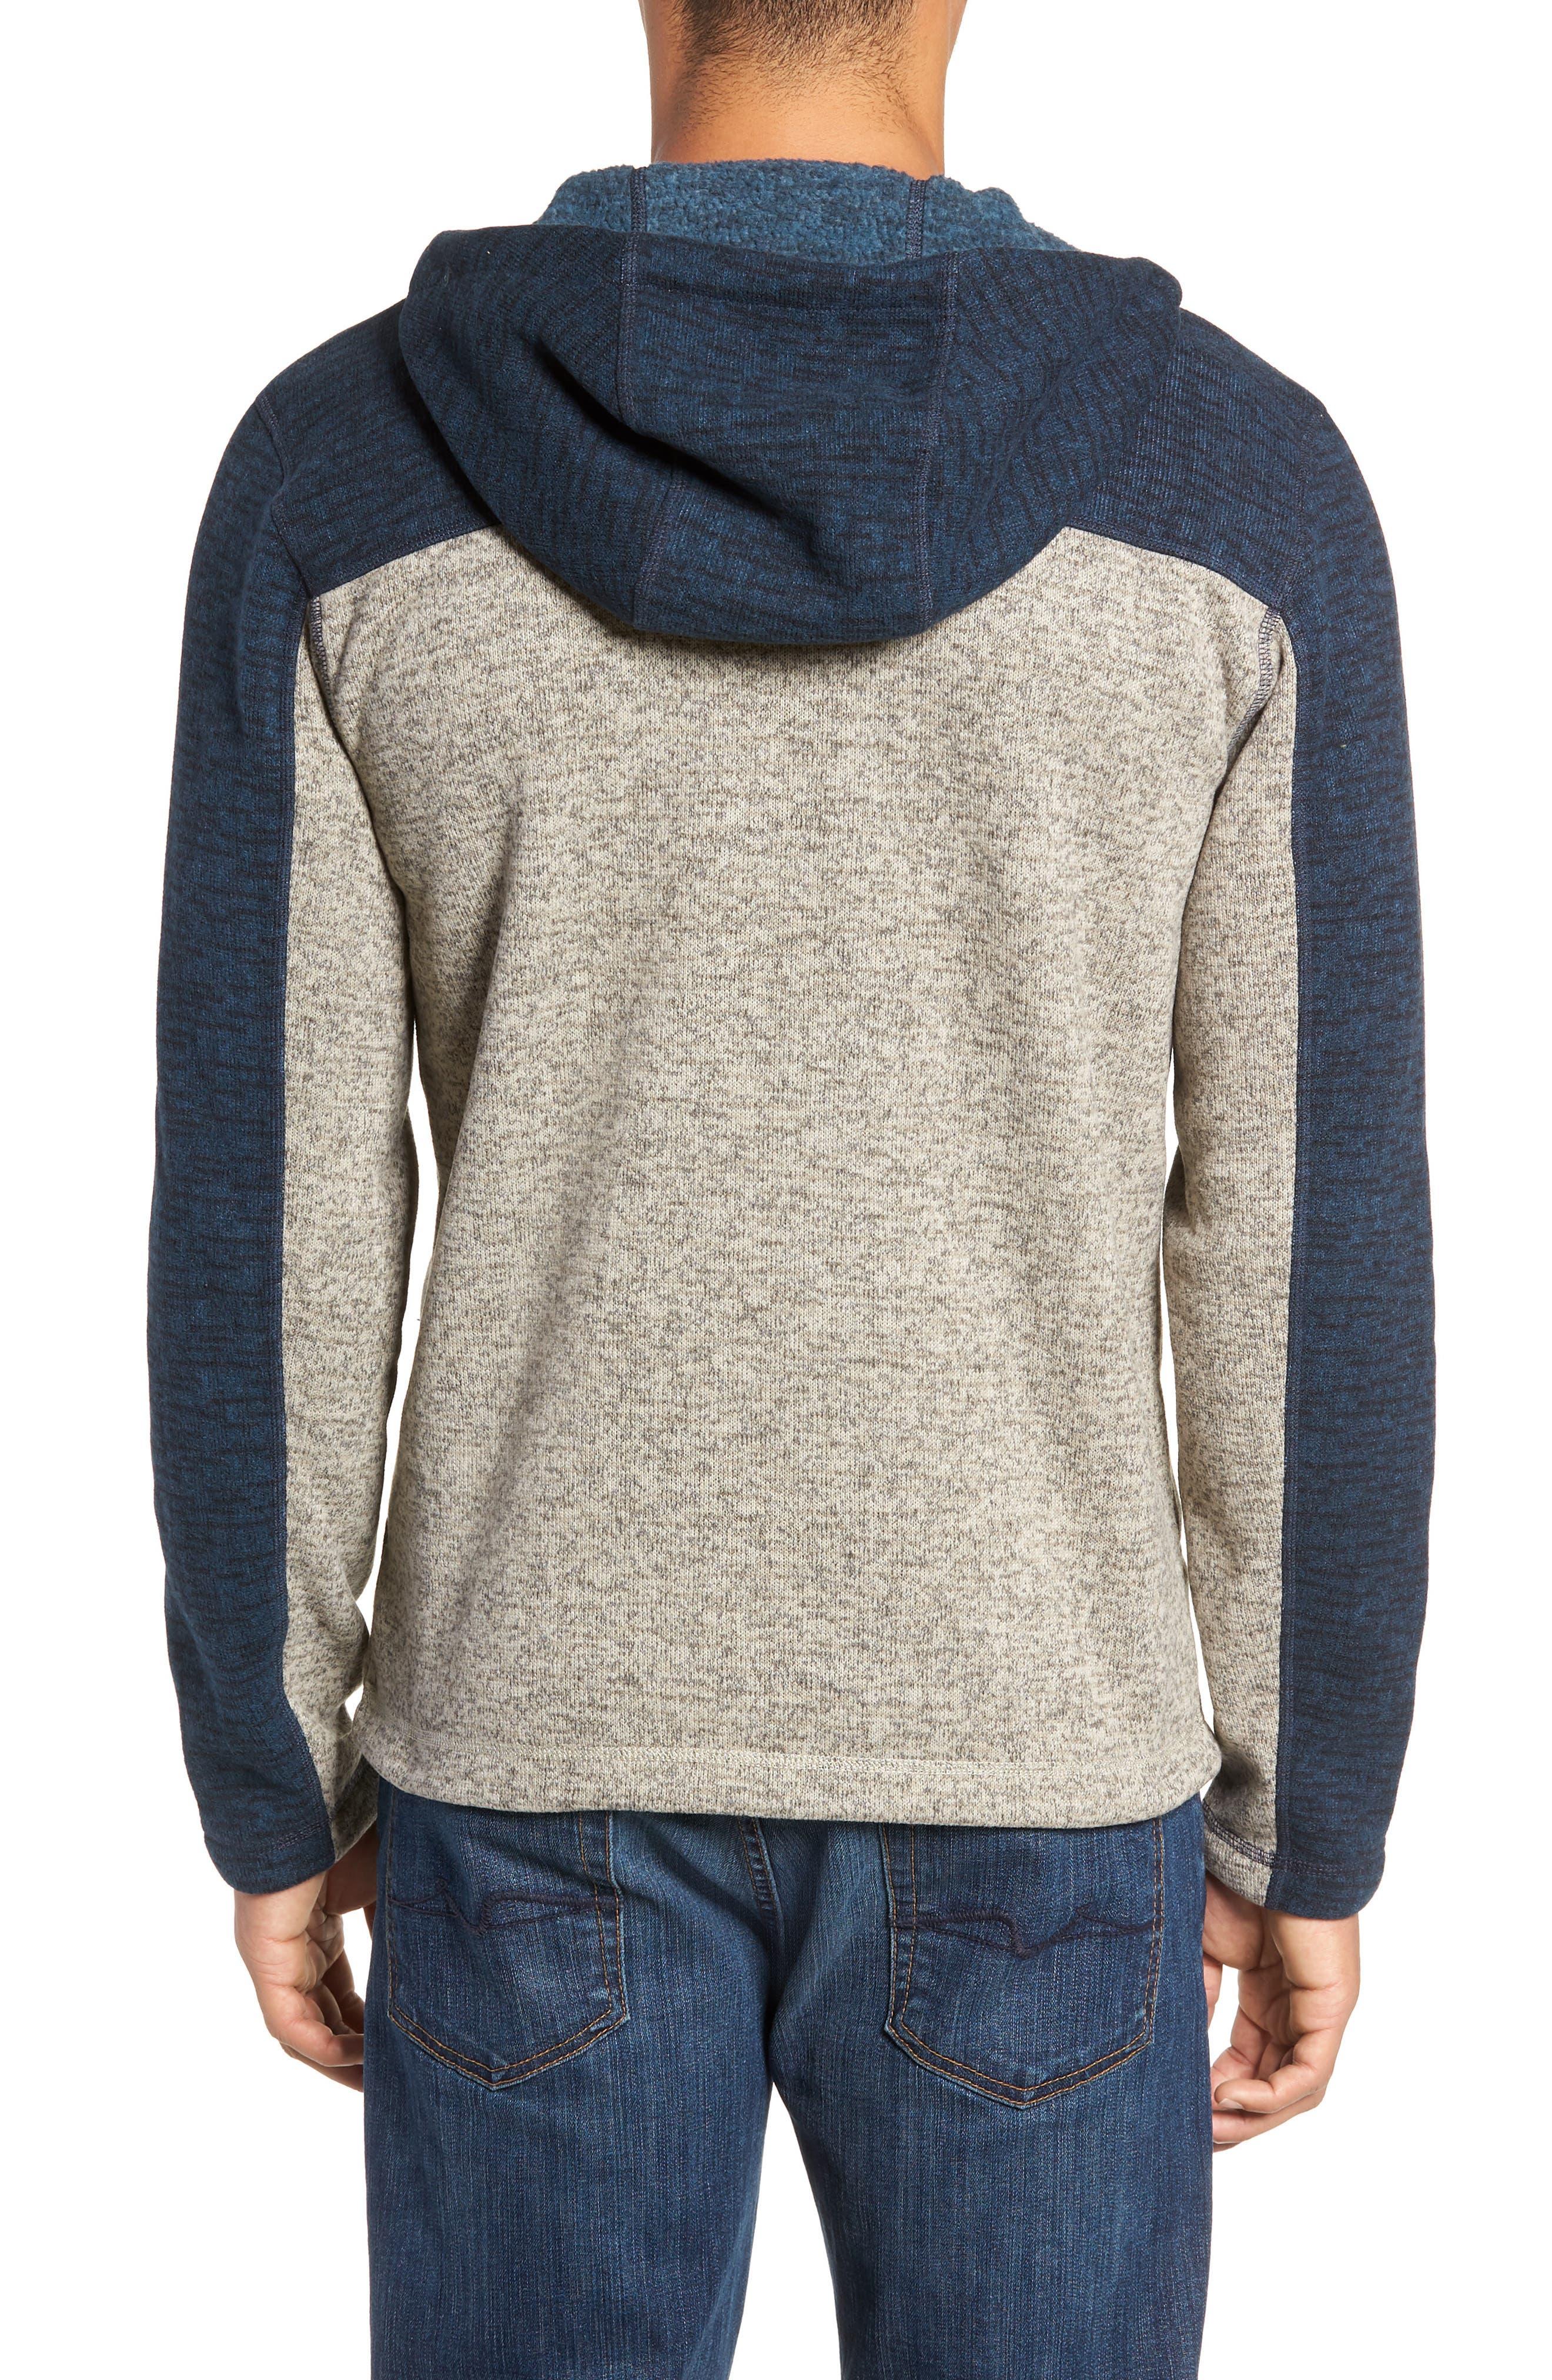 Gordon Lyons Alpine Sweater Fleece Hoodie,                             Alternate thumbnail 2, color,                             URBAN NAVY/ GRANITE BLUFF TAN